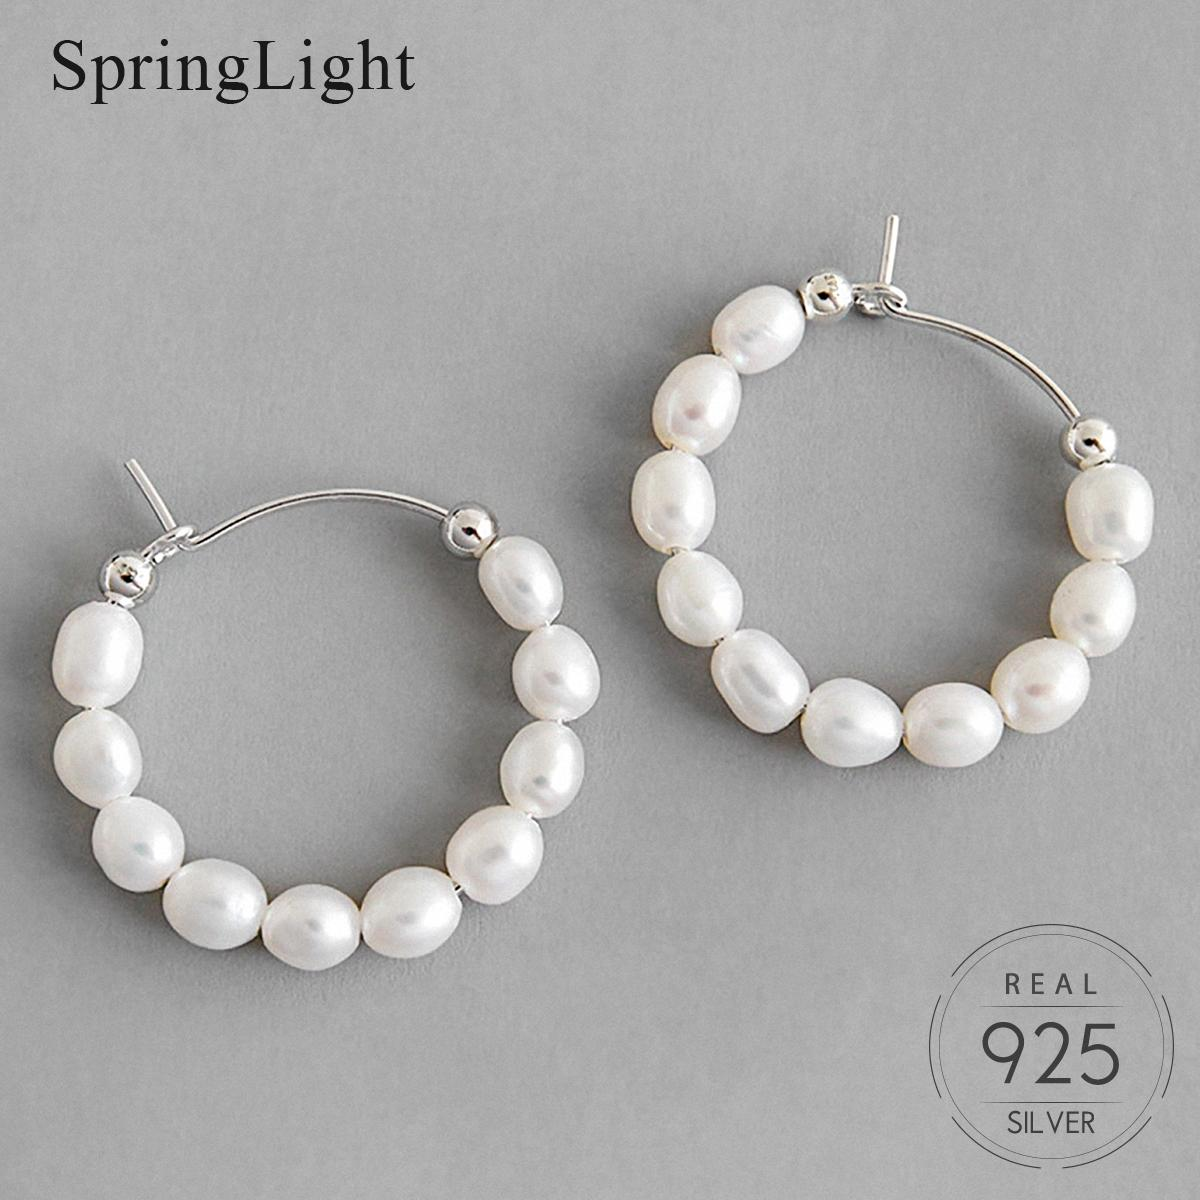 Springlight Temperament Pearl Round Earrings 925 Sterling Silver Ins Korean Style Elegant Hoop Earrings for Women Fine Jewelry